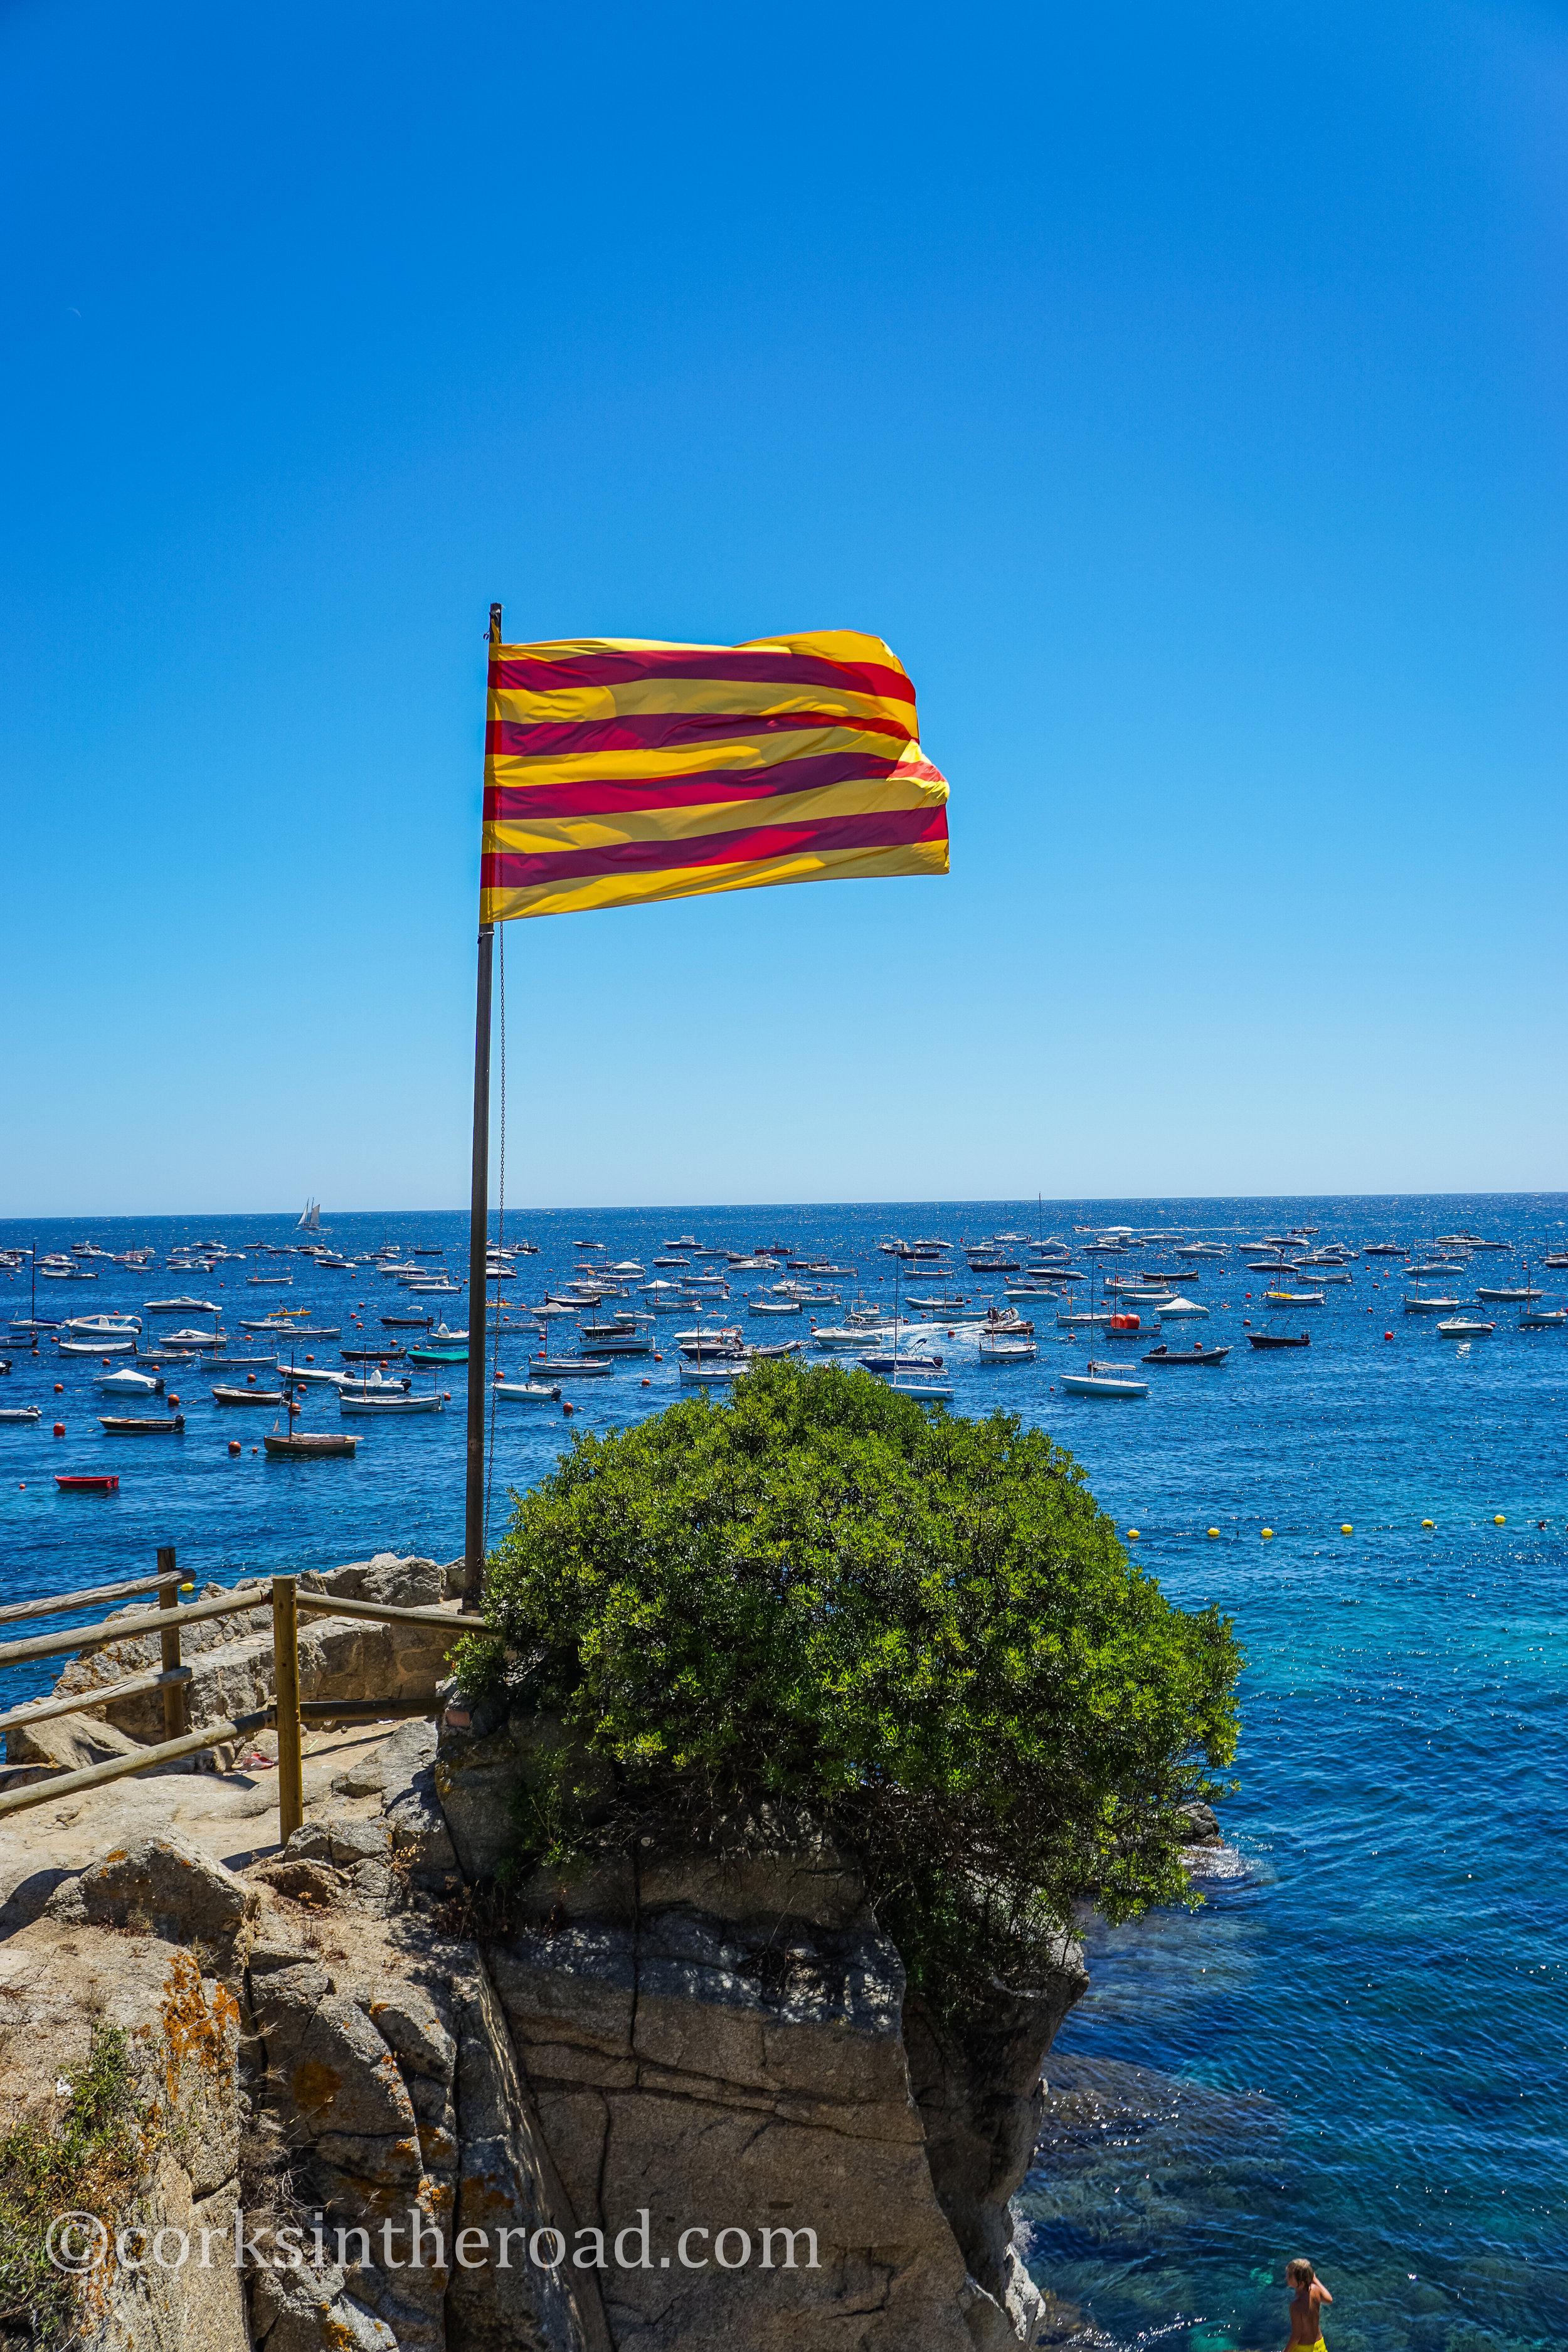 20160807Barcelona, Beaches, Corksintheroad, Costa Brava, Costa Brava Landscape-5.jpg